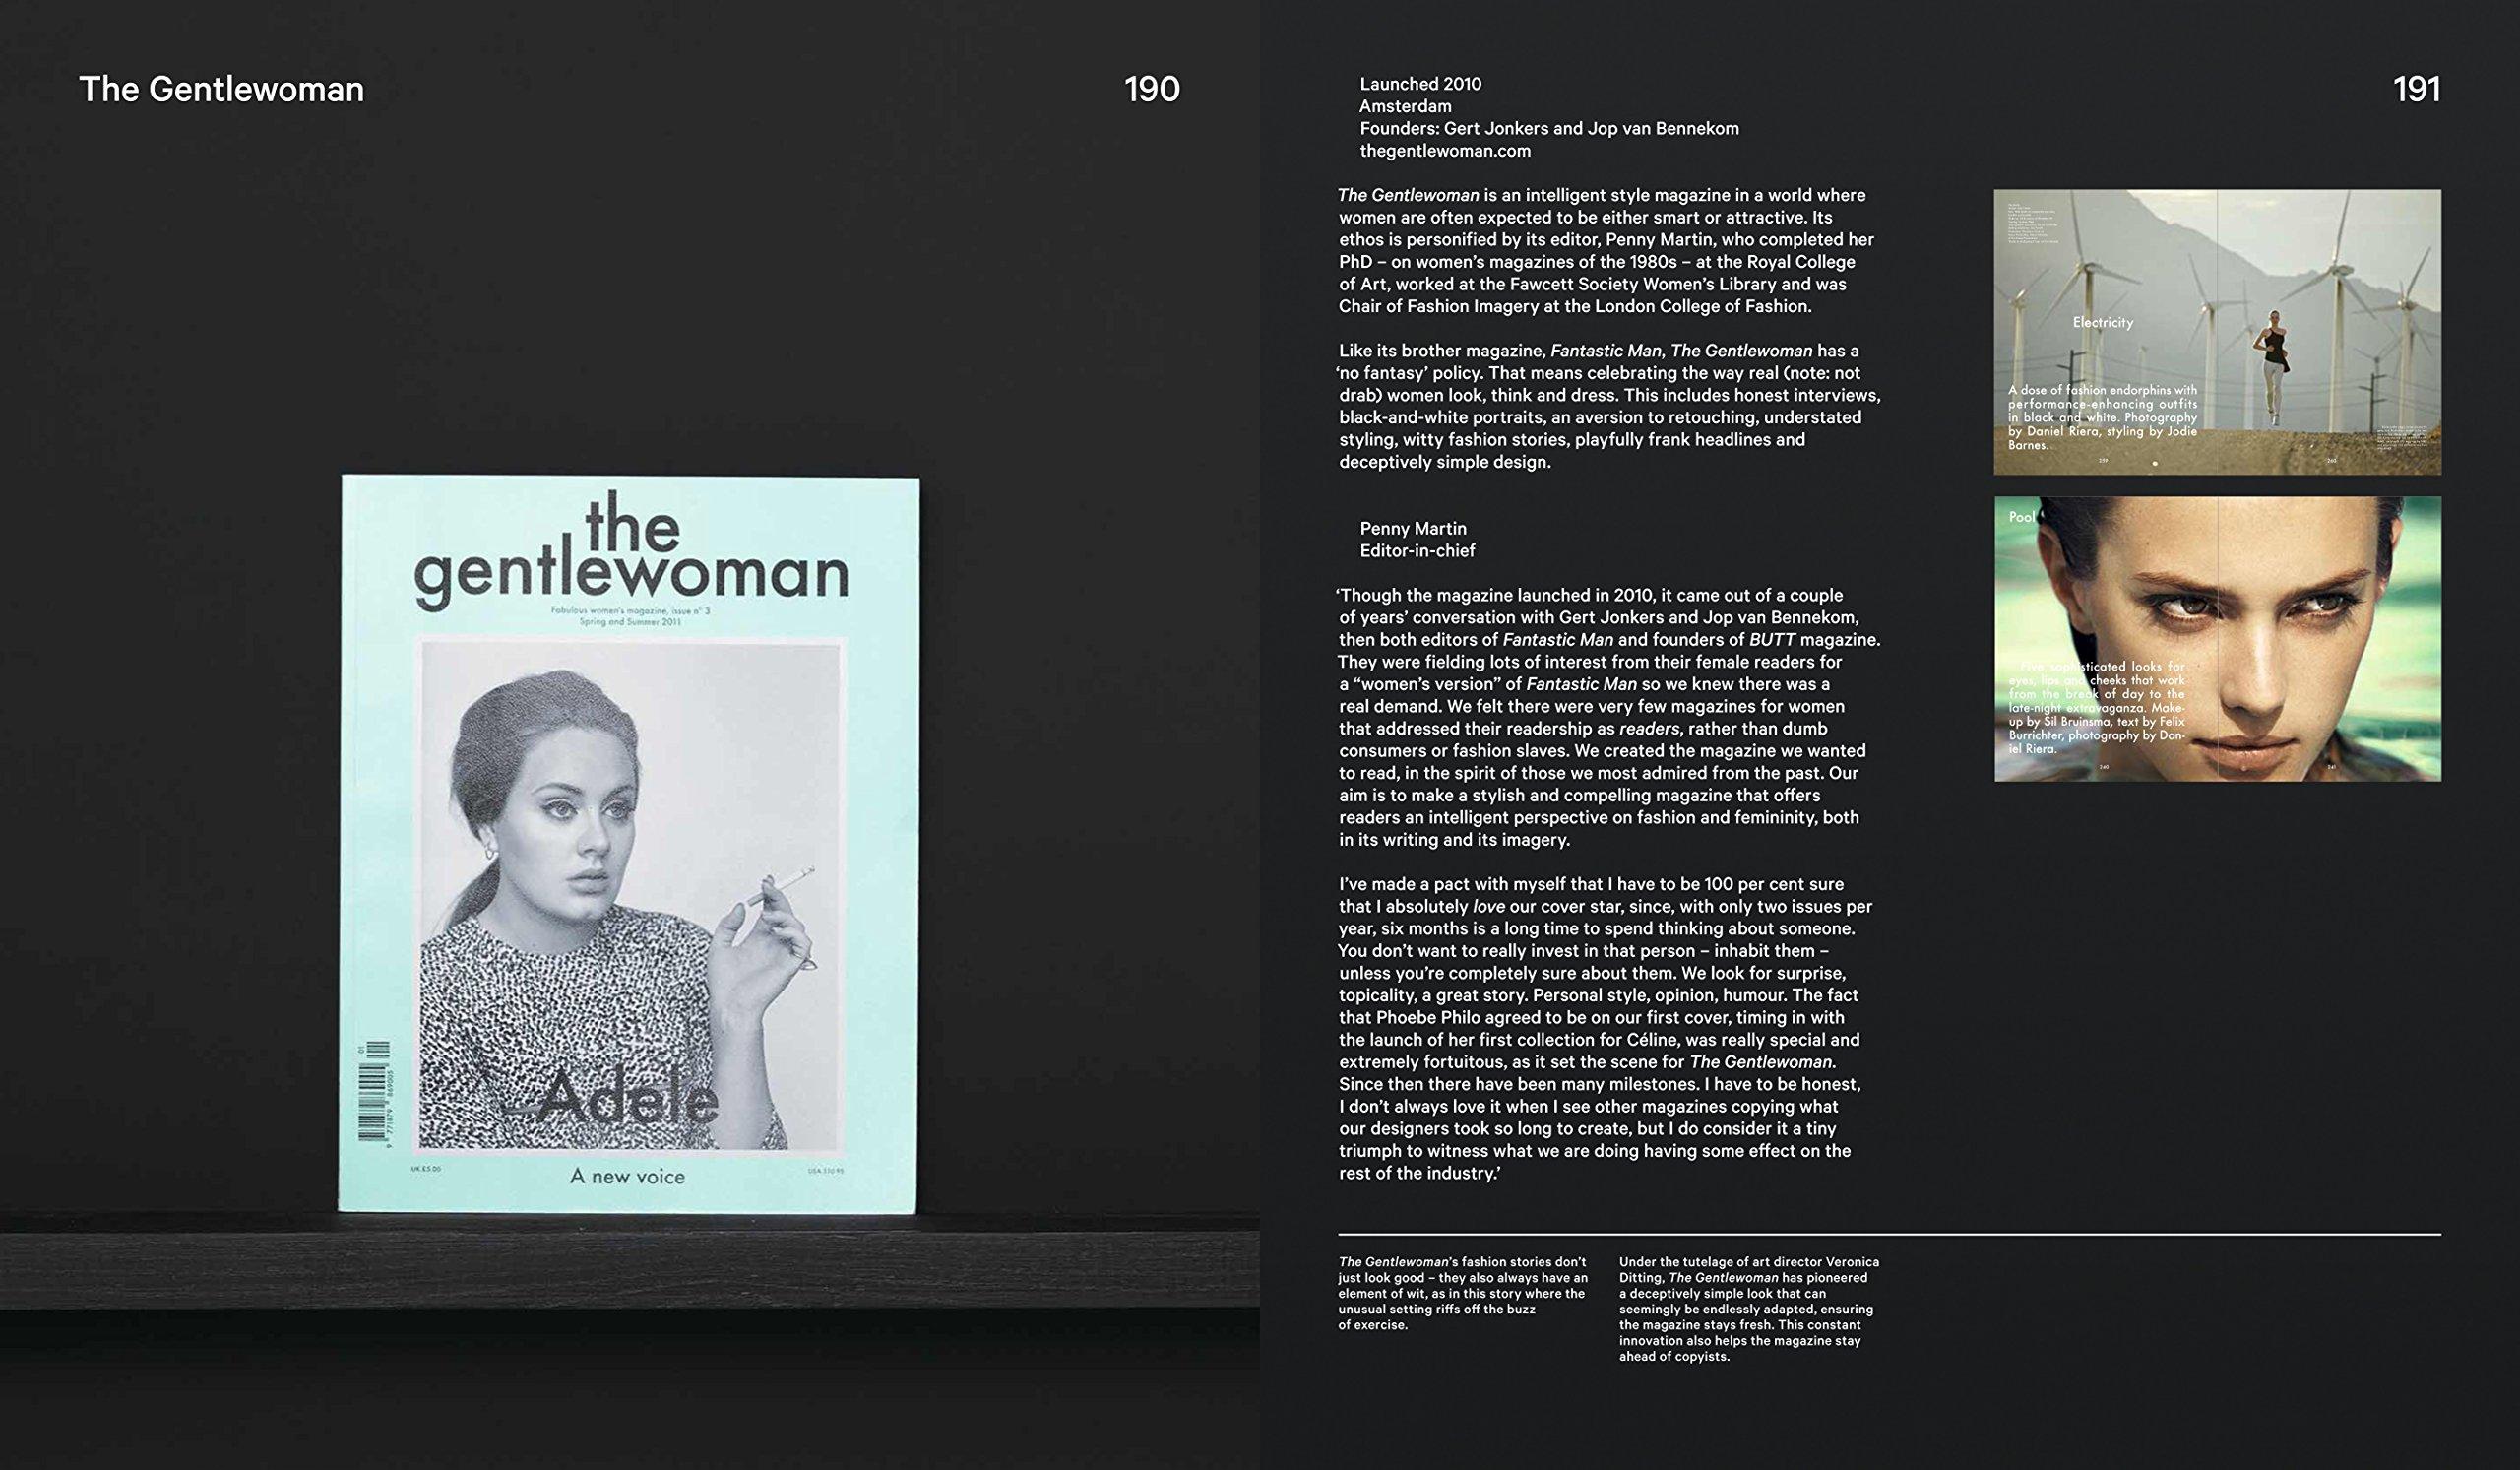 print-is-dead-long-live-print-book6